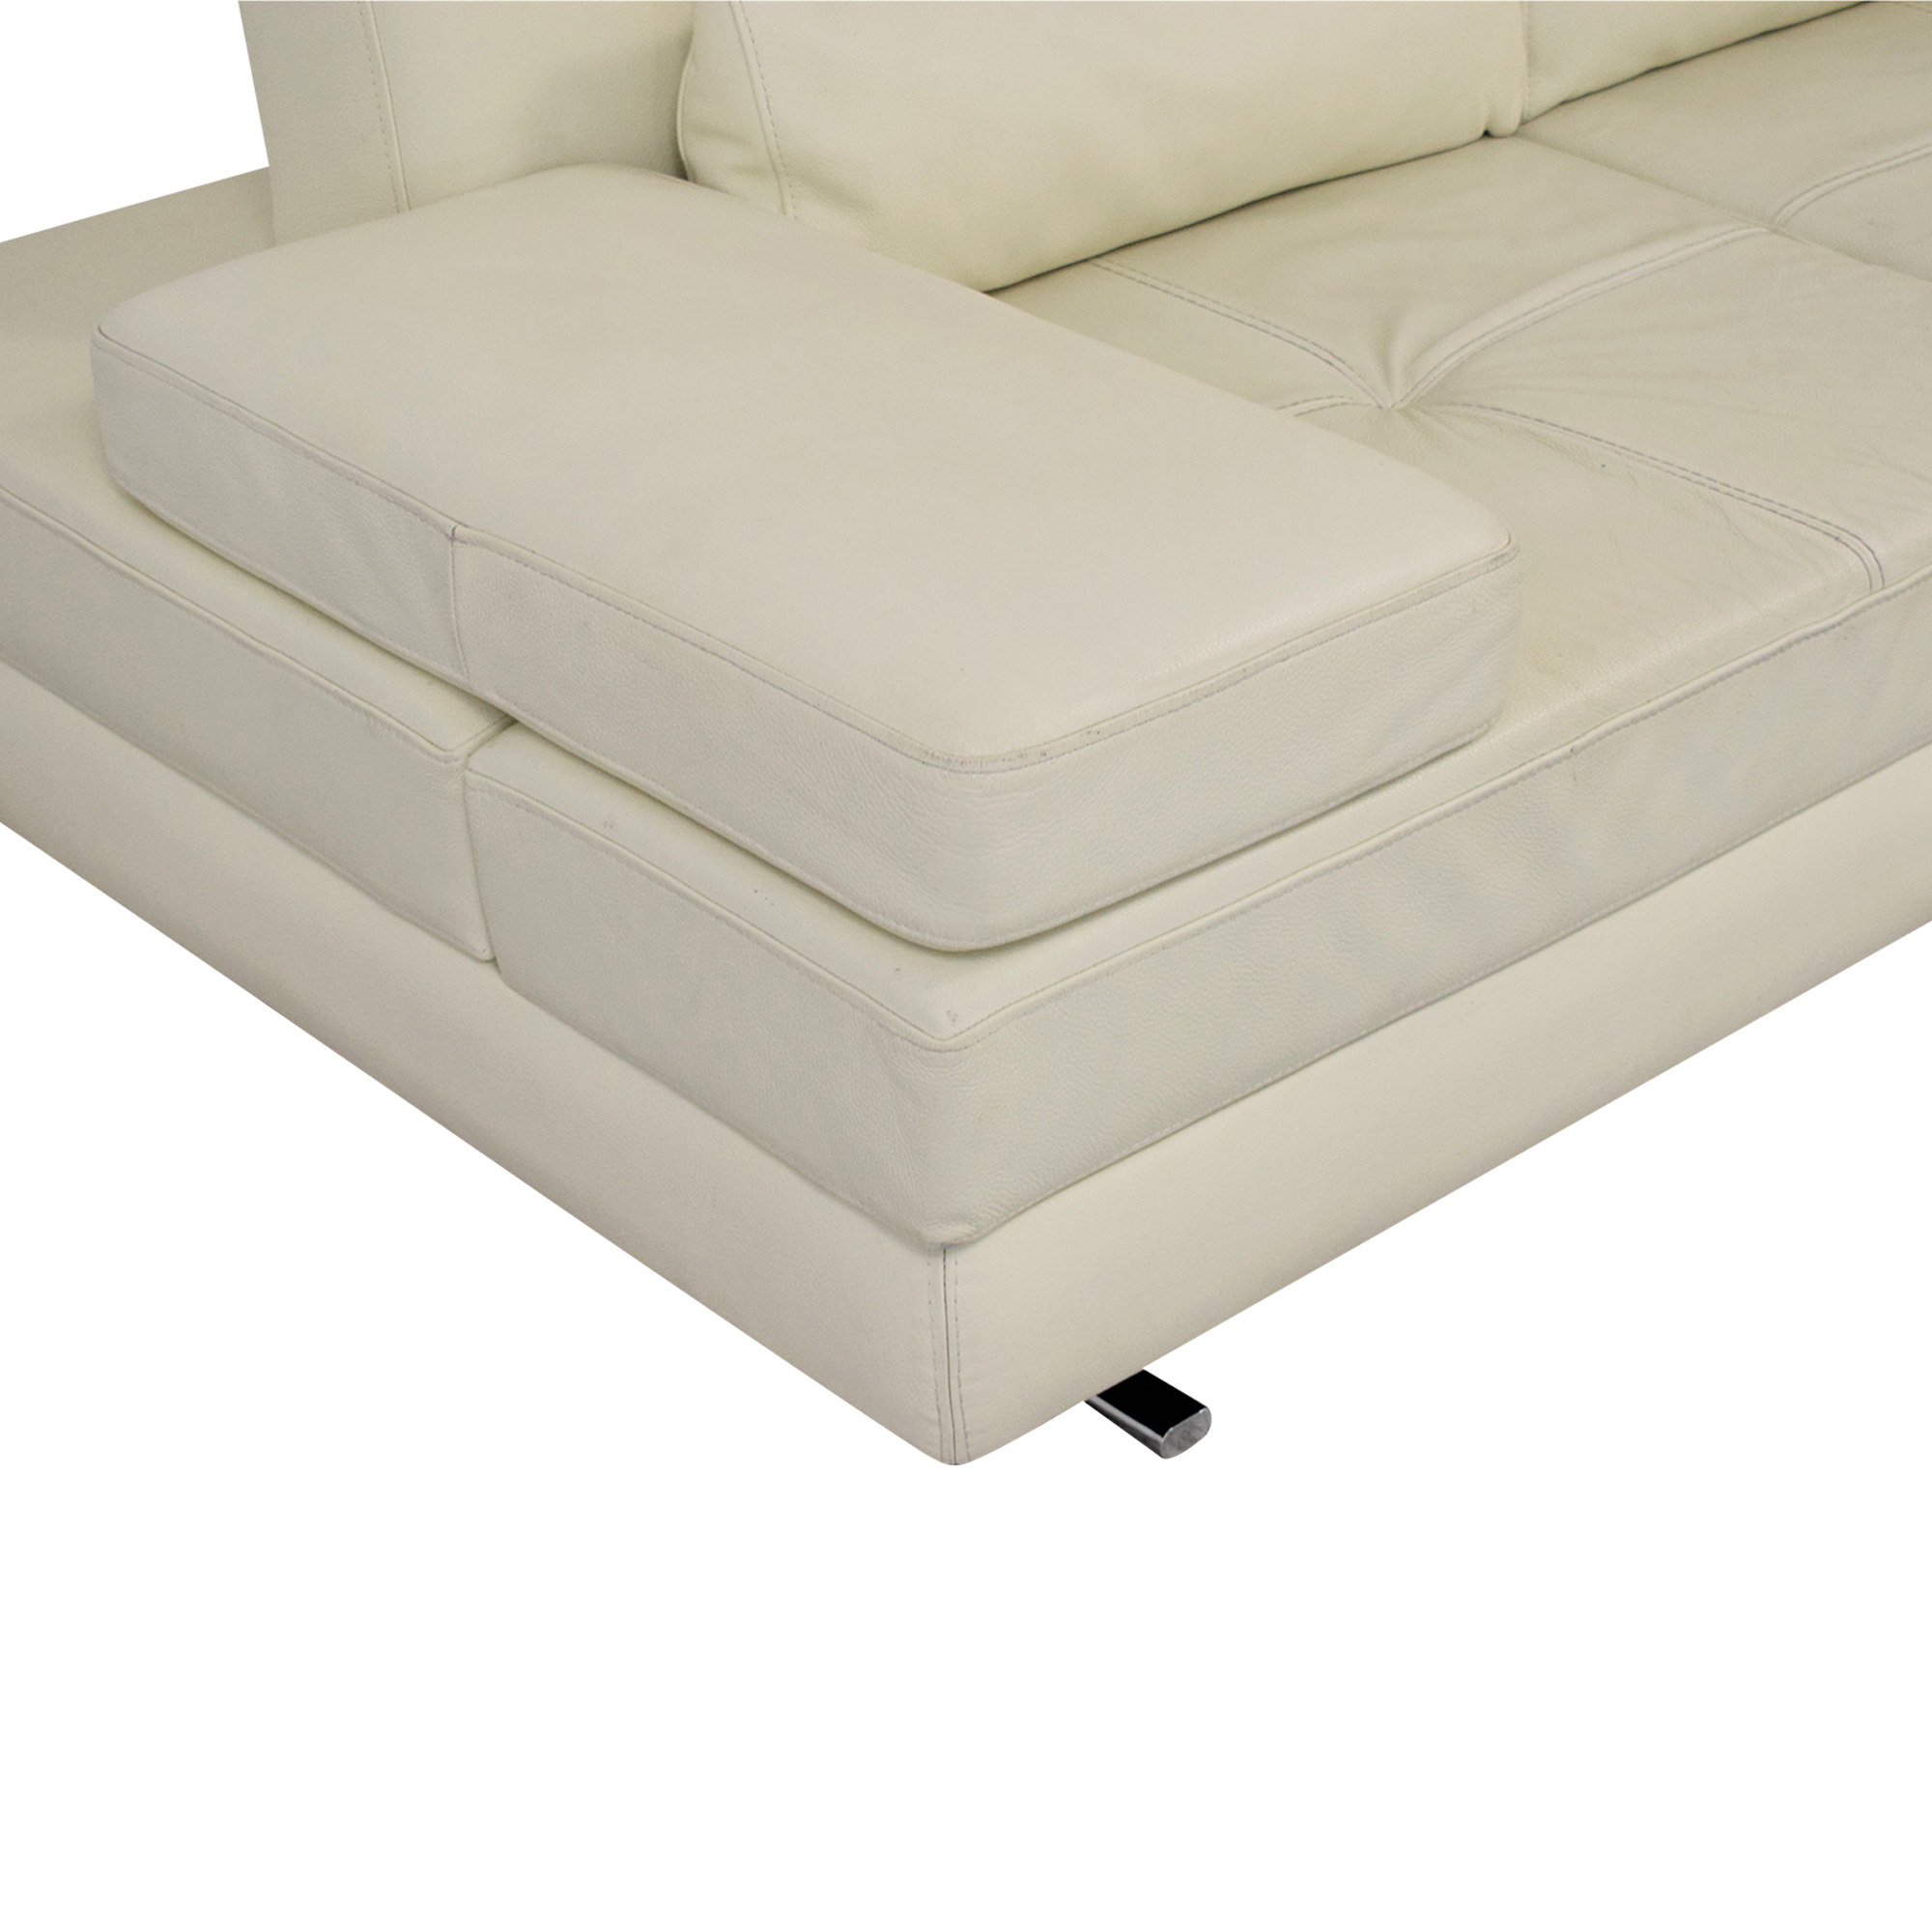 Lazzoni Lazzoni Mony Full Sleeper Sofa white